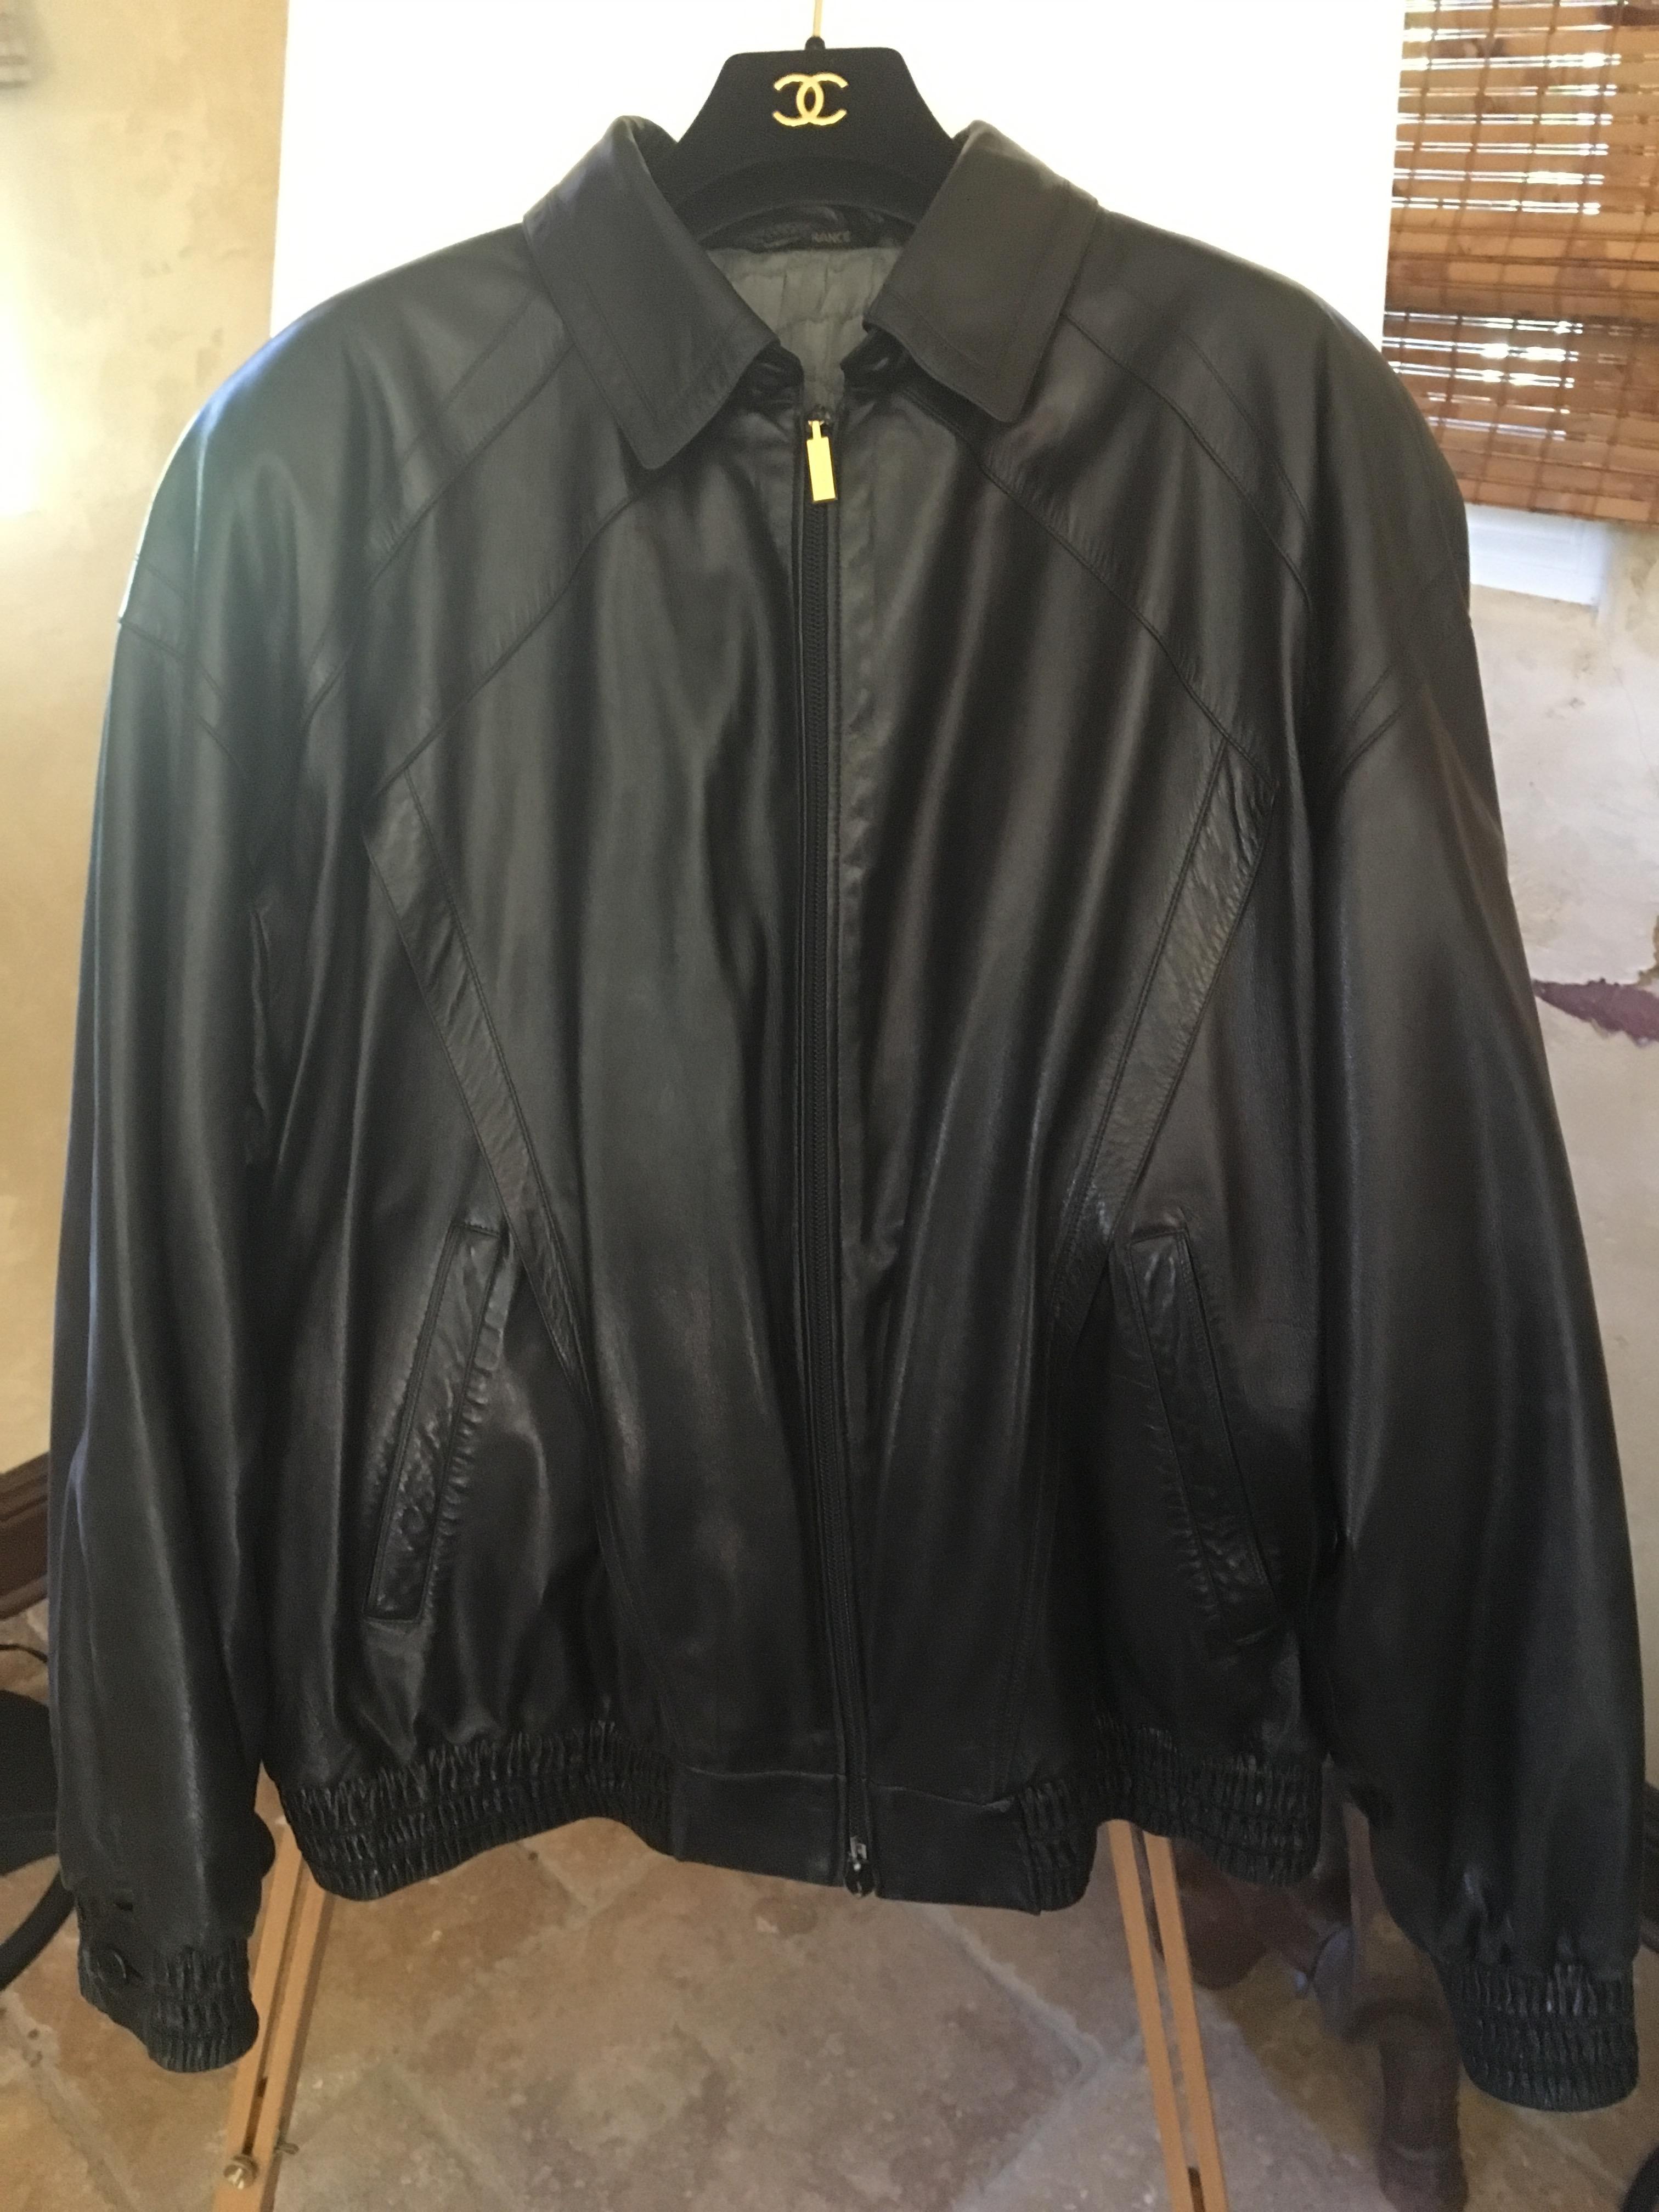 7bd010e3d32a Zilli Men s Jacket Zilli Calves Skin Leather Black Size 42-3 European 54  Size l - Leather Jackets for Sale - Grailed